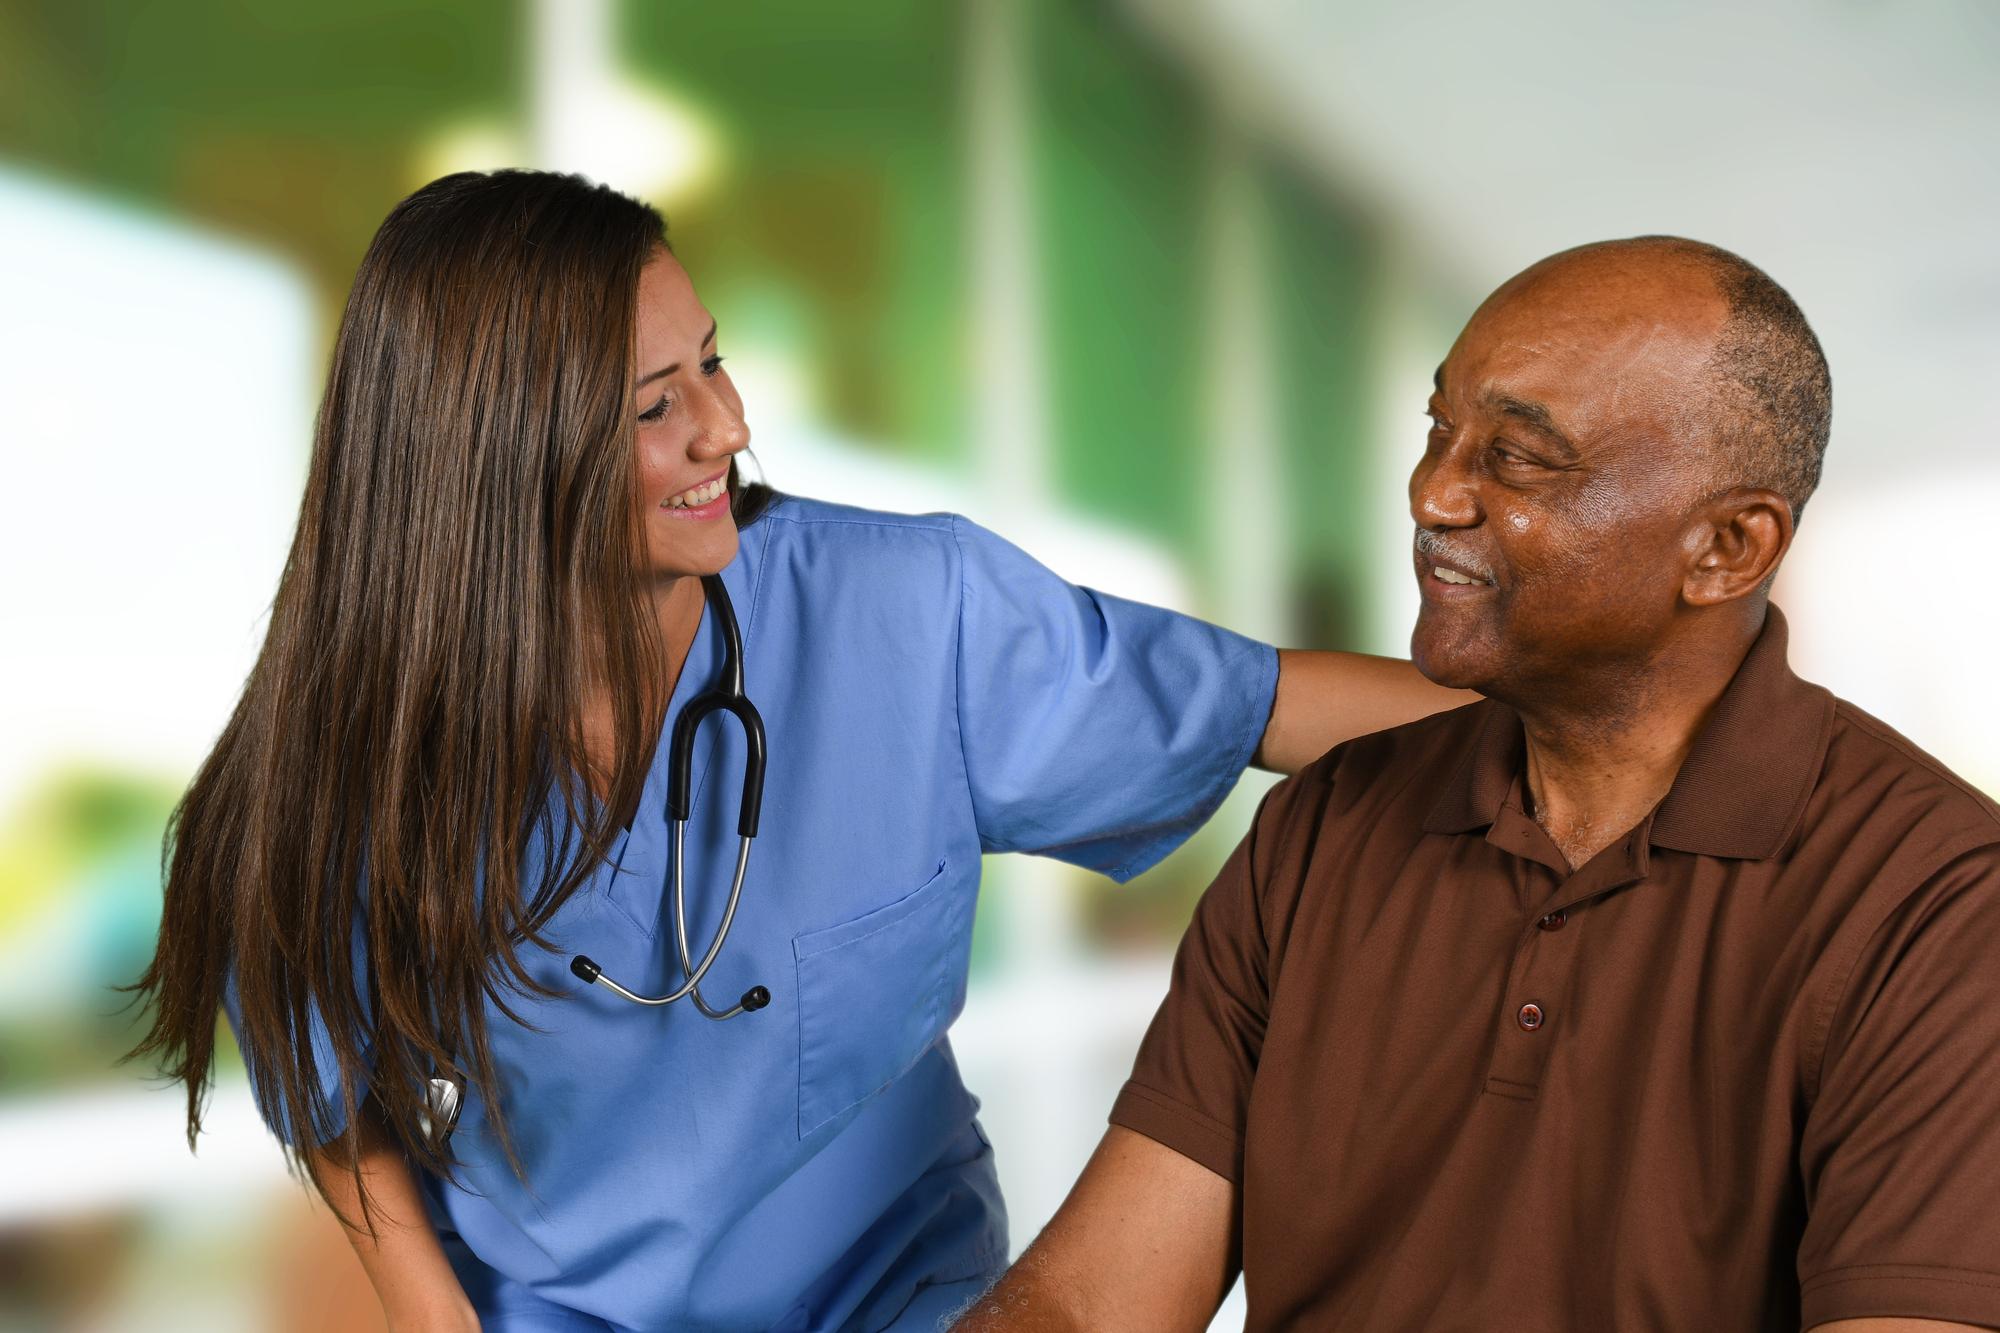 Caregiver Helping An Elderly Patient